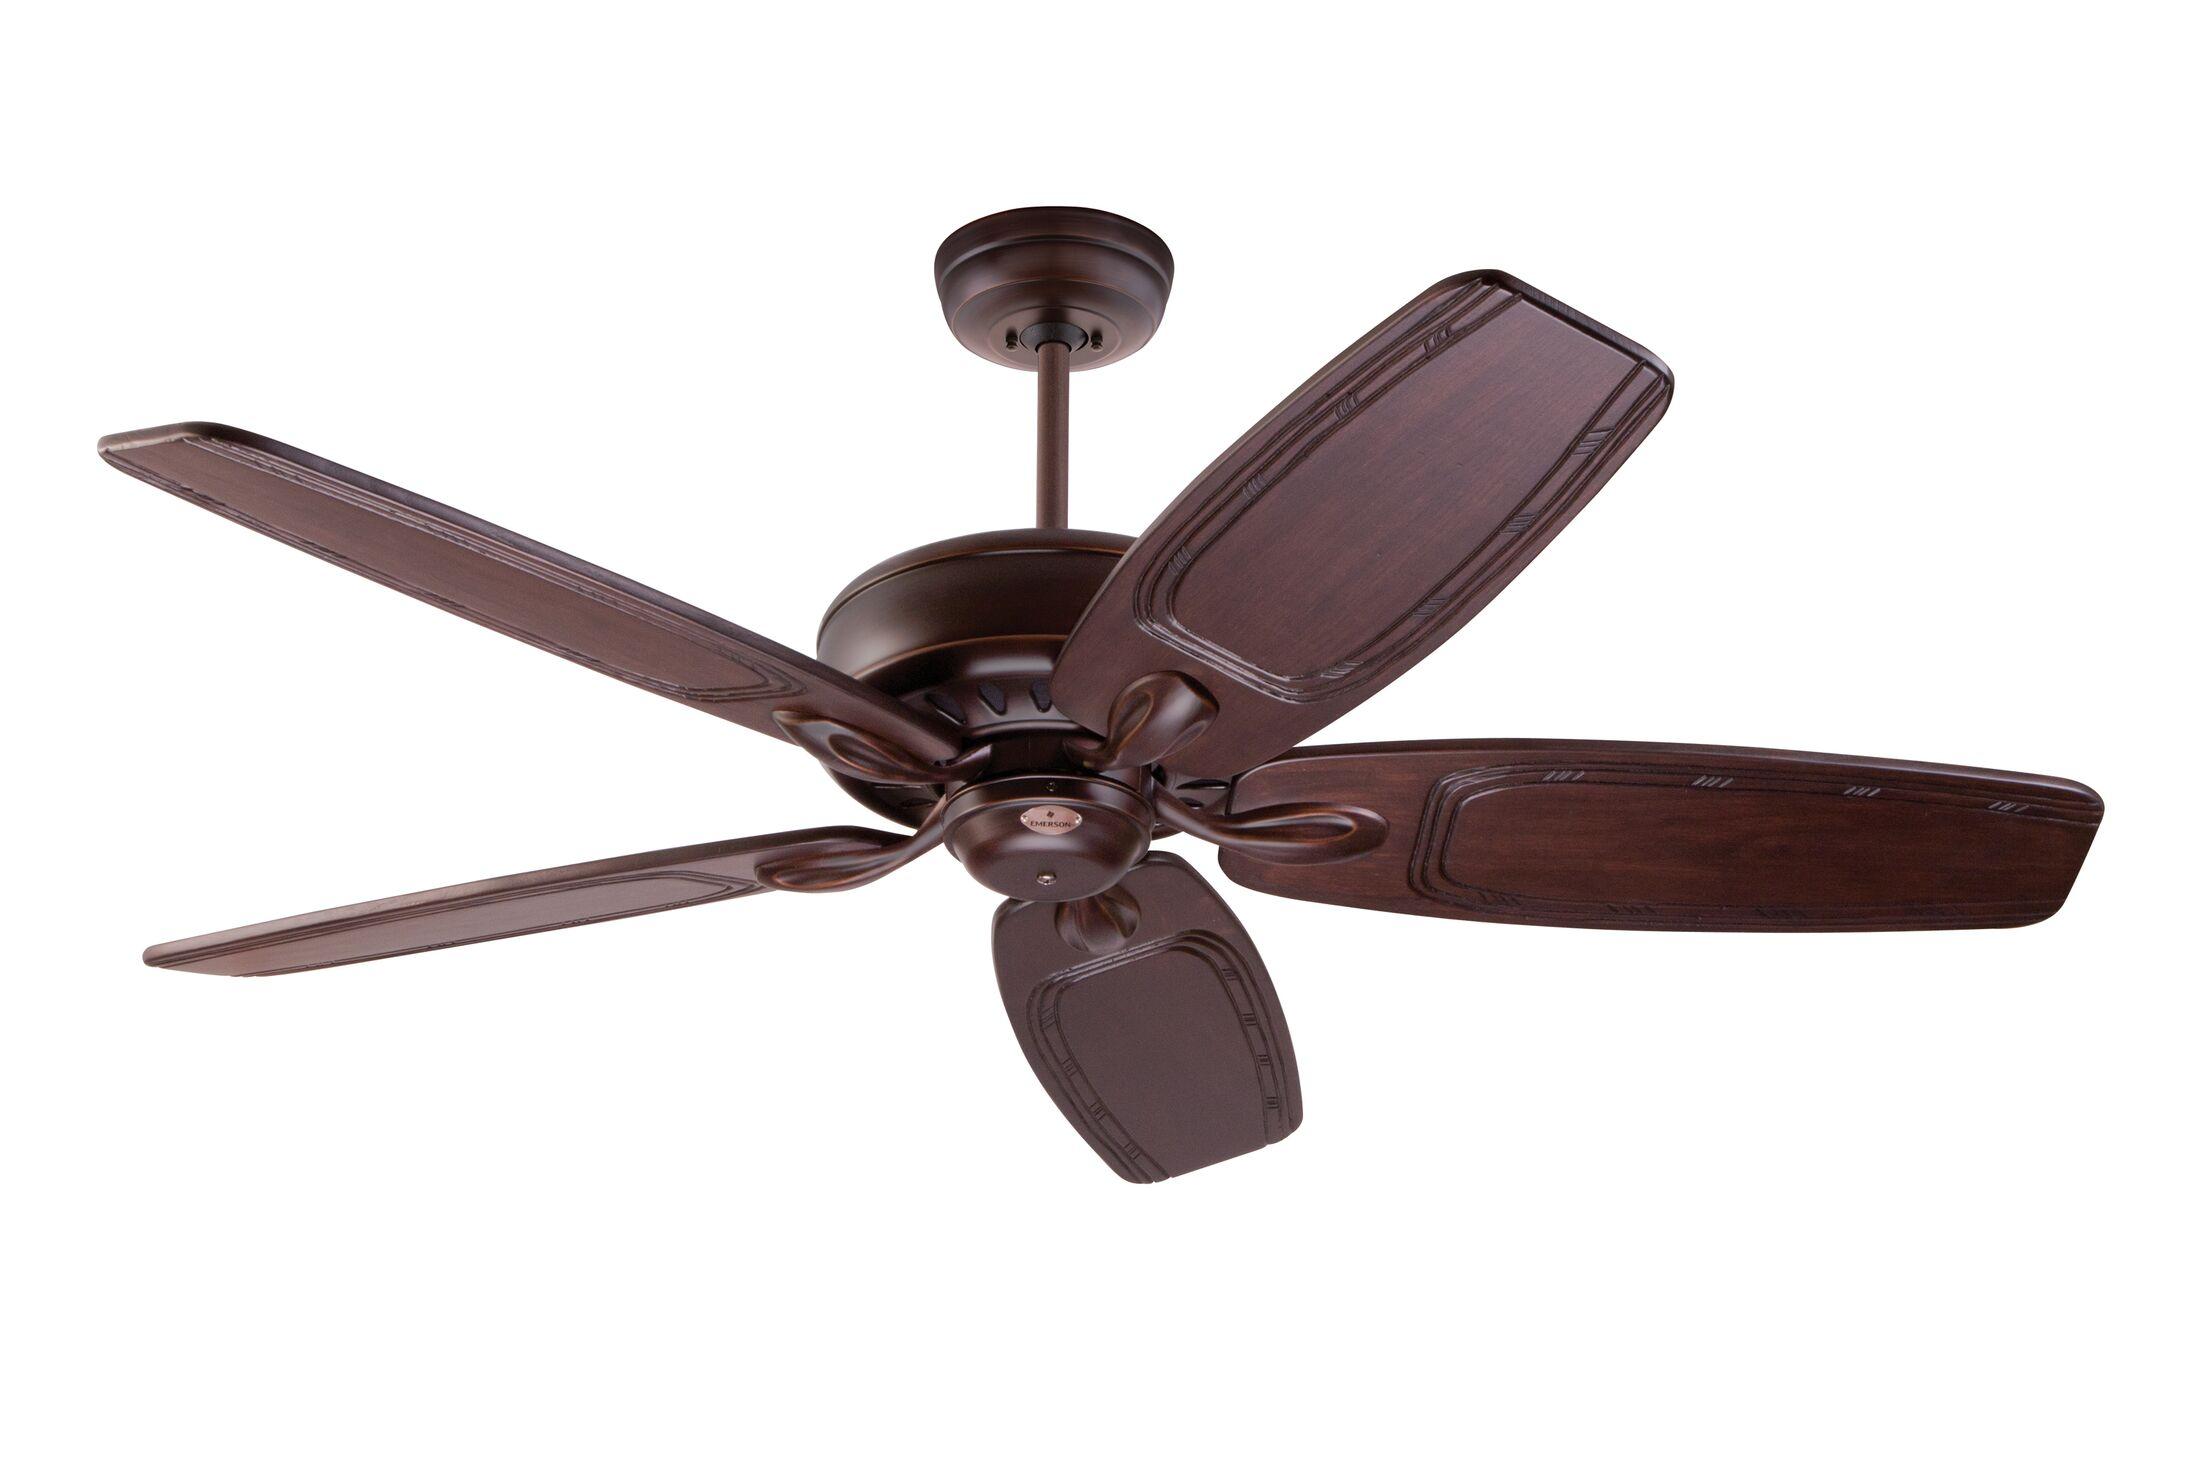 Huemiller 5 Blade Ceiling Fan with Remote Blade Finish: Venetian Bronze, Housing Finish: Venetian Bronze